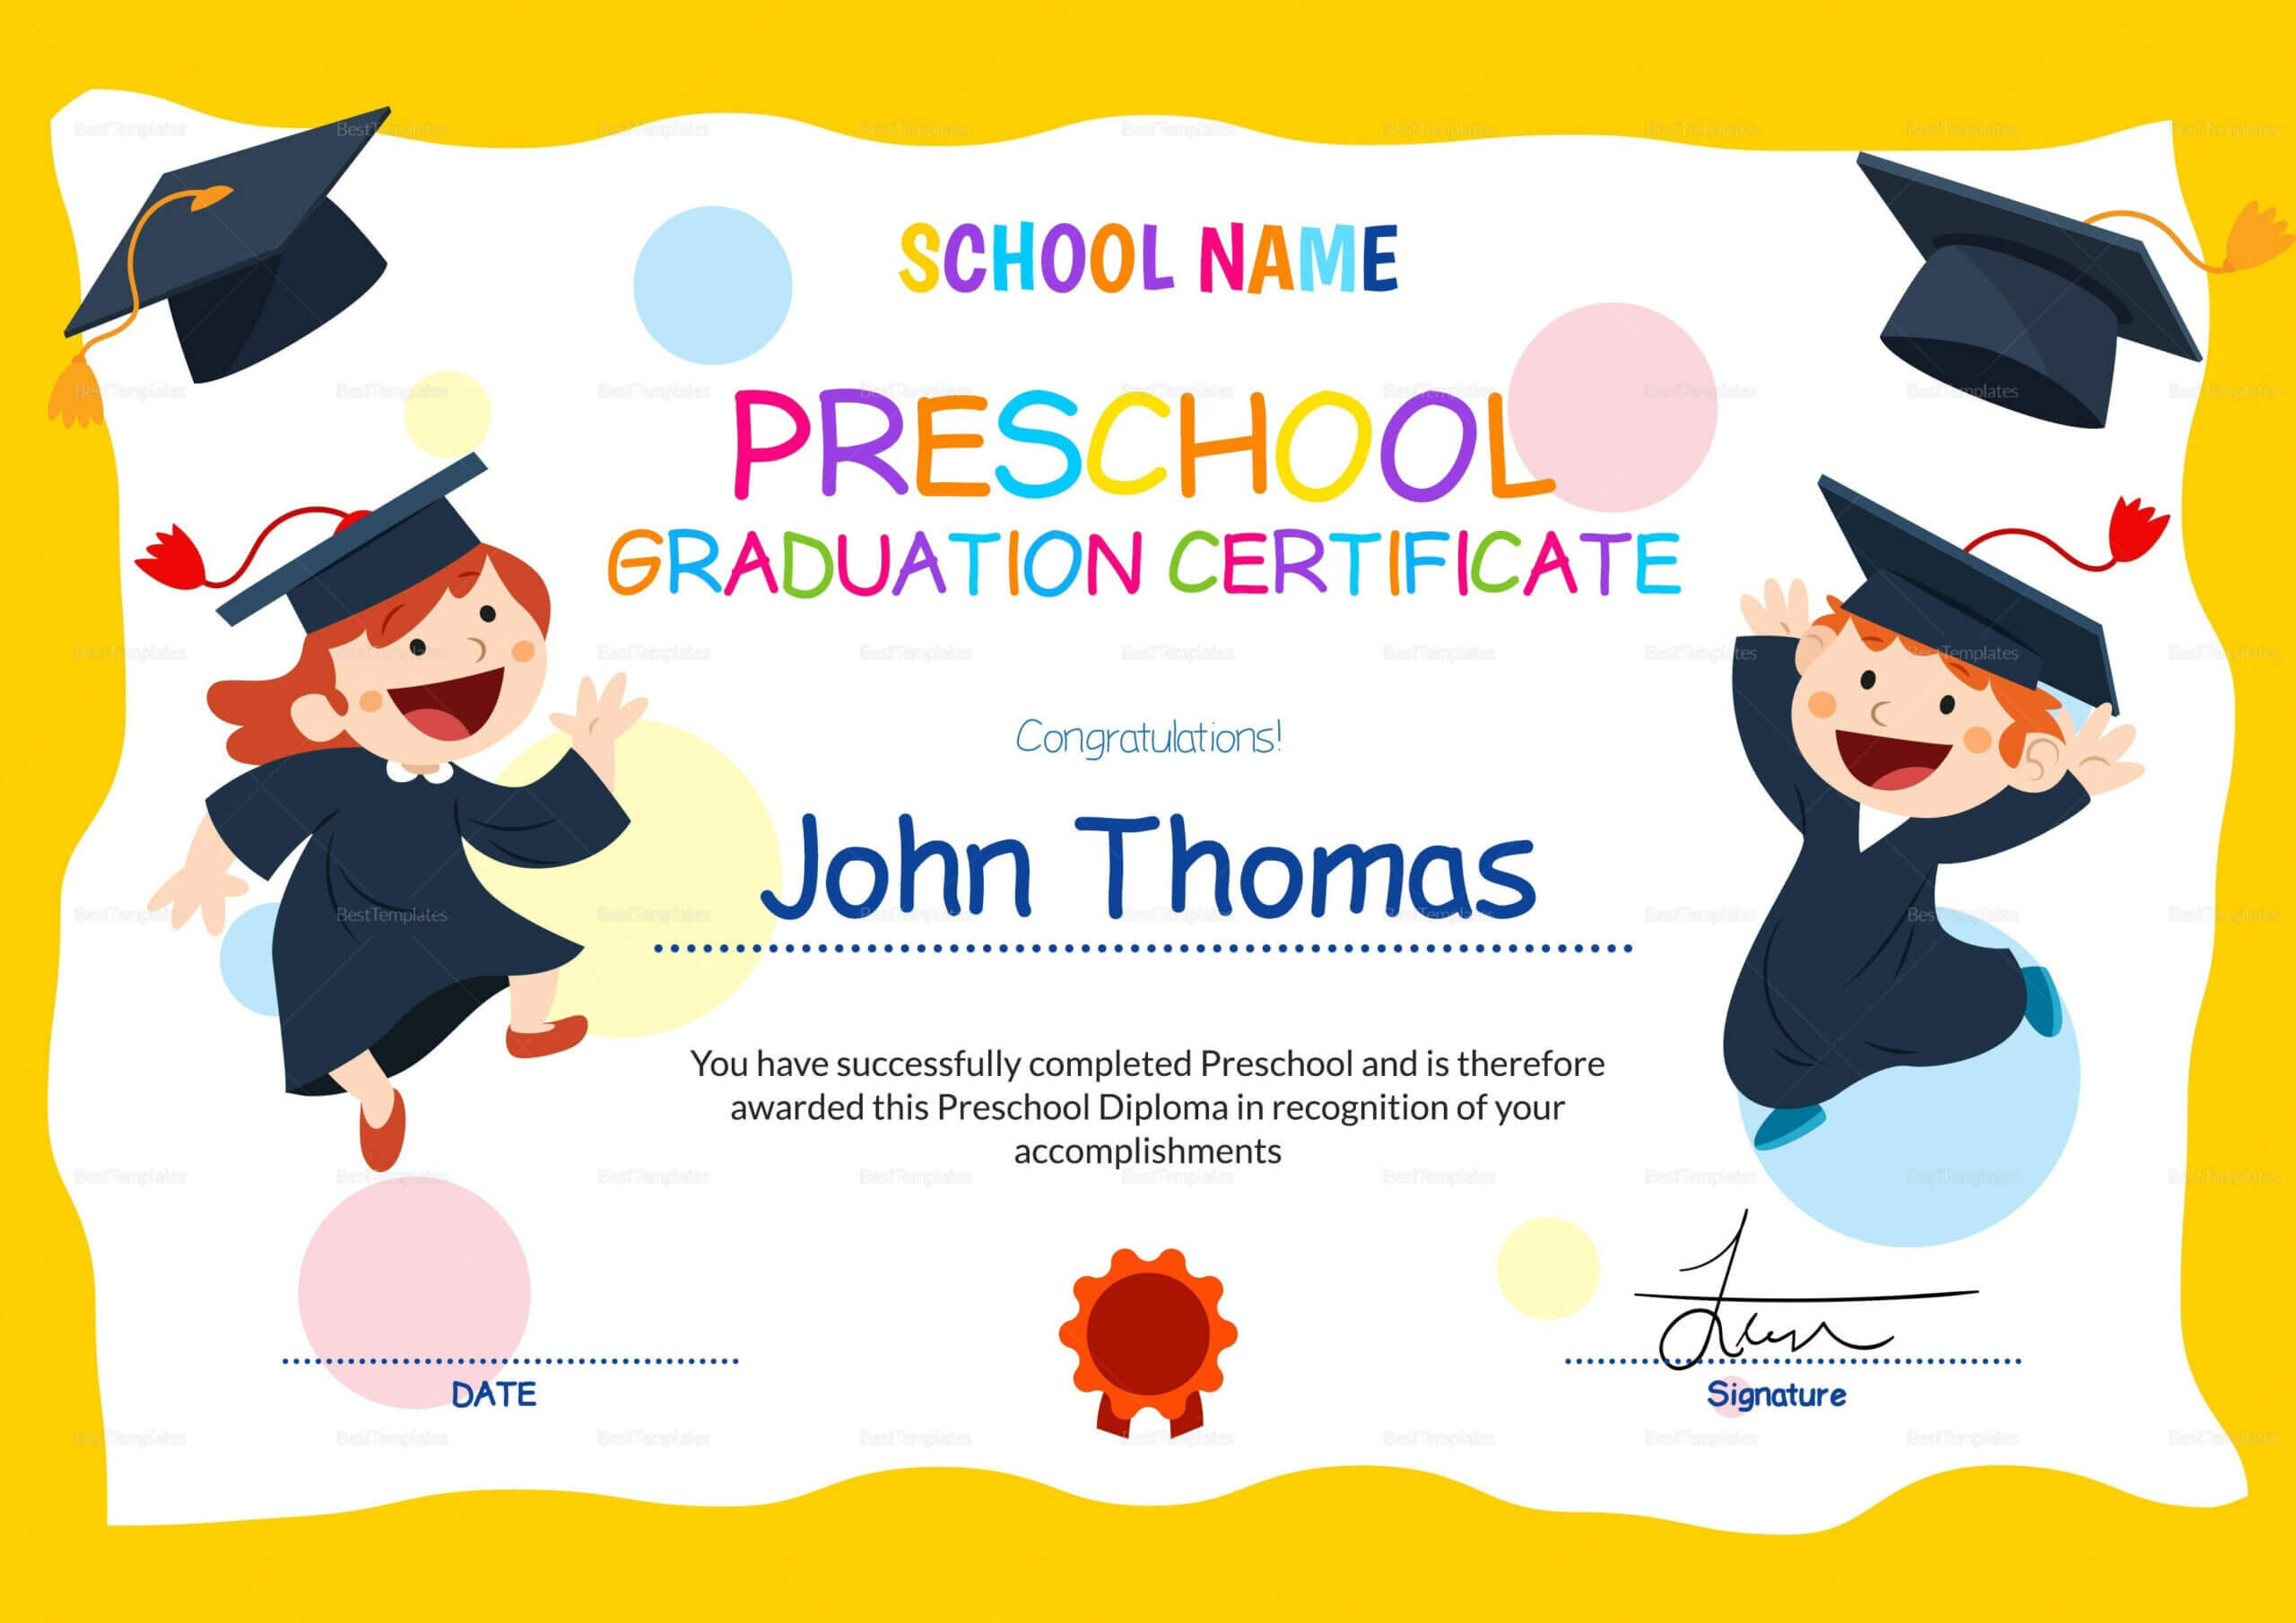 11+ Preschool Certificate Templates - Pdf | Free & Premium For Preschool Graduation Certificate Template Free